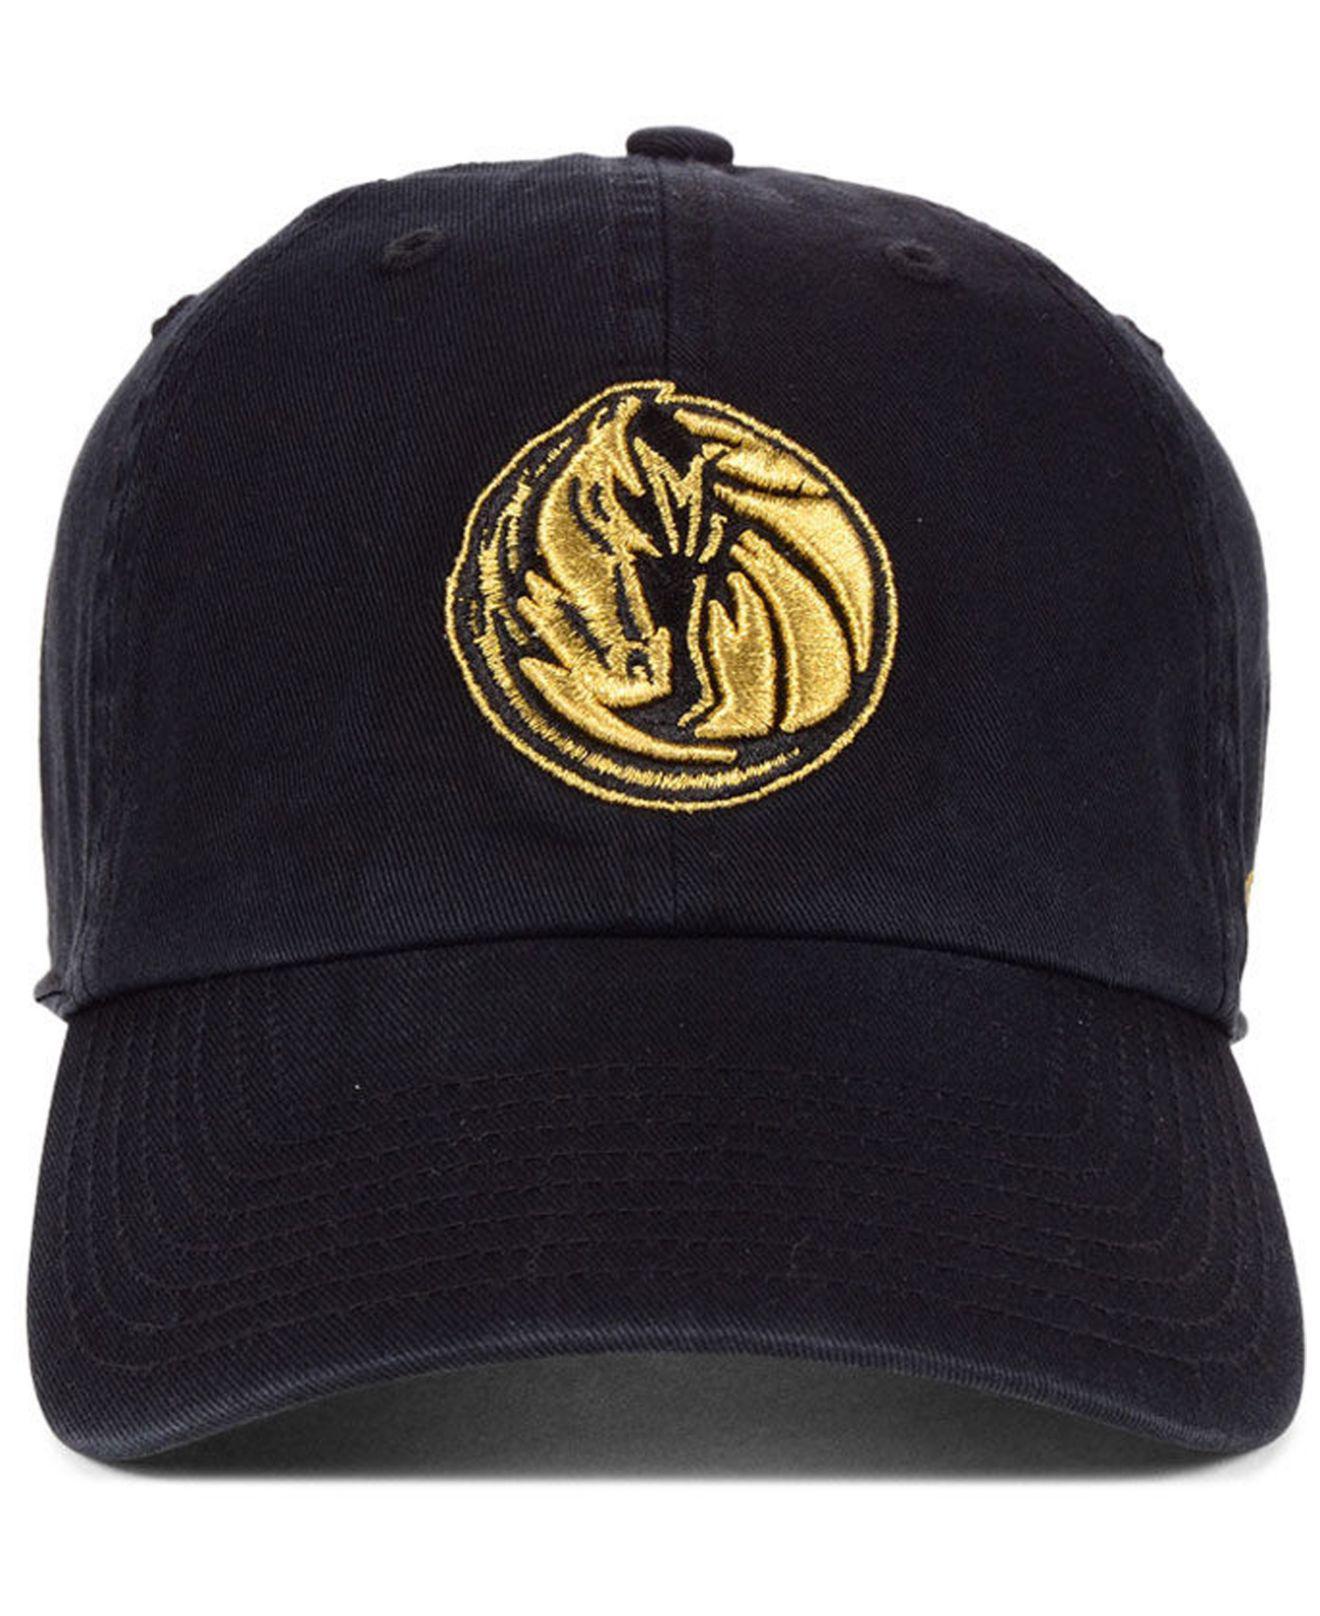 best service 02bef b7af4 ... hot lyst 47 brand dallas mavericks met gold clean up cap for men a5389  1b688